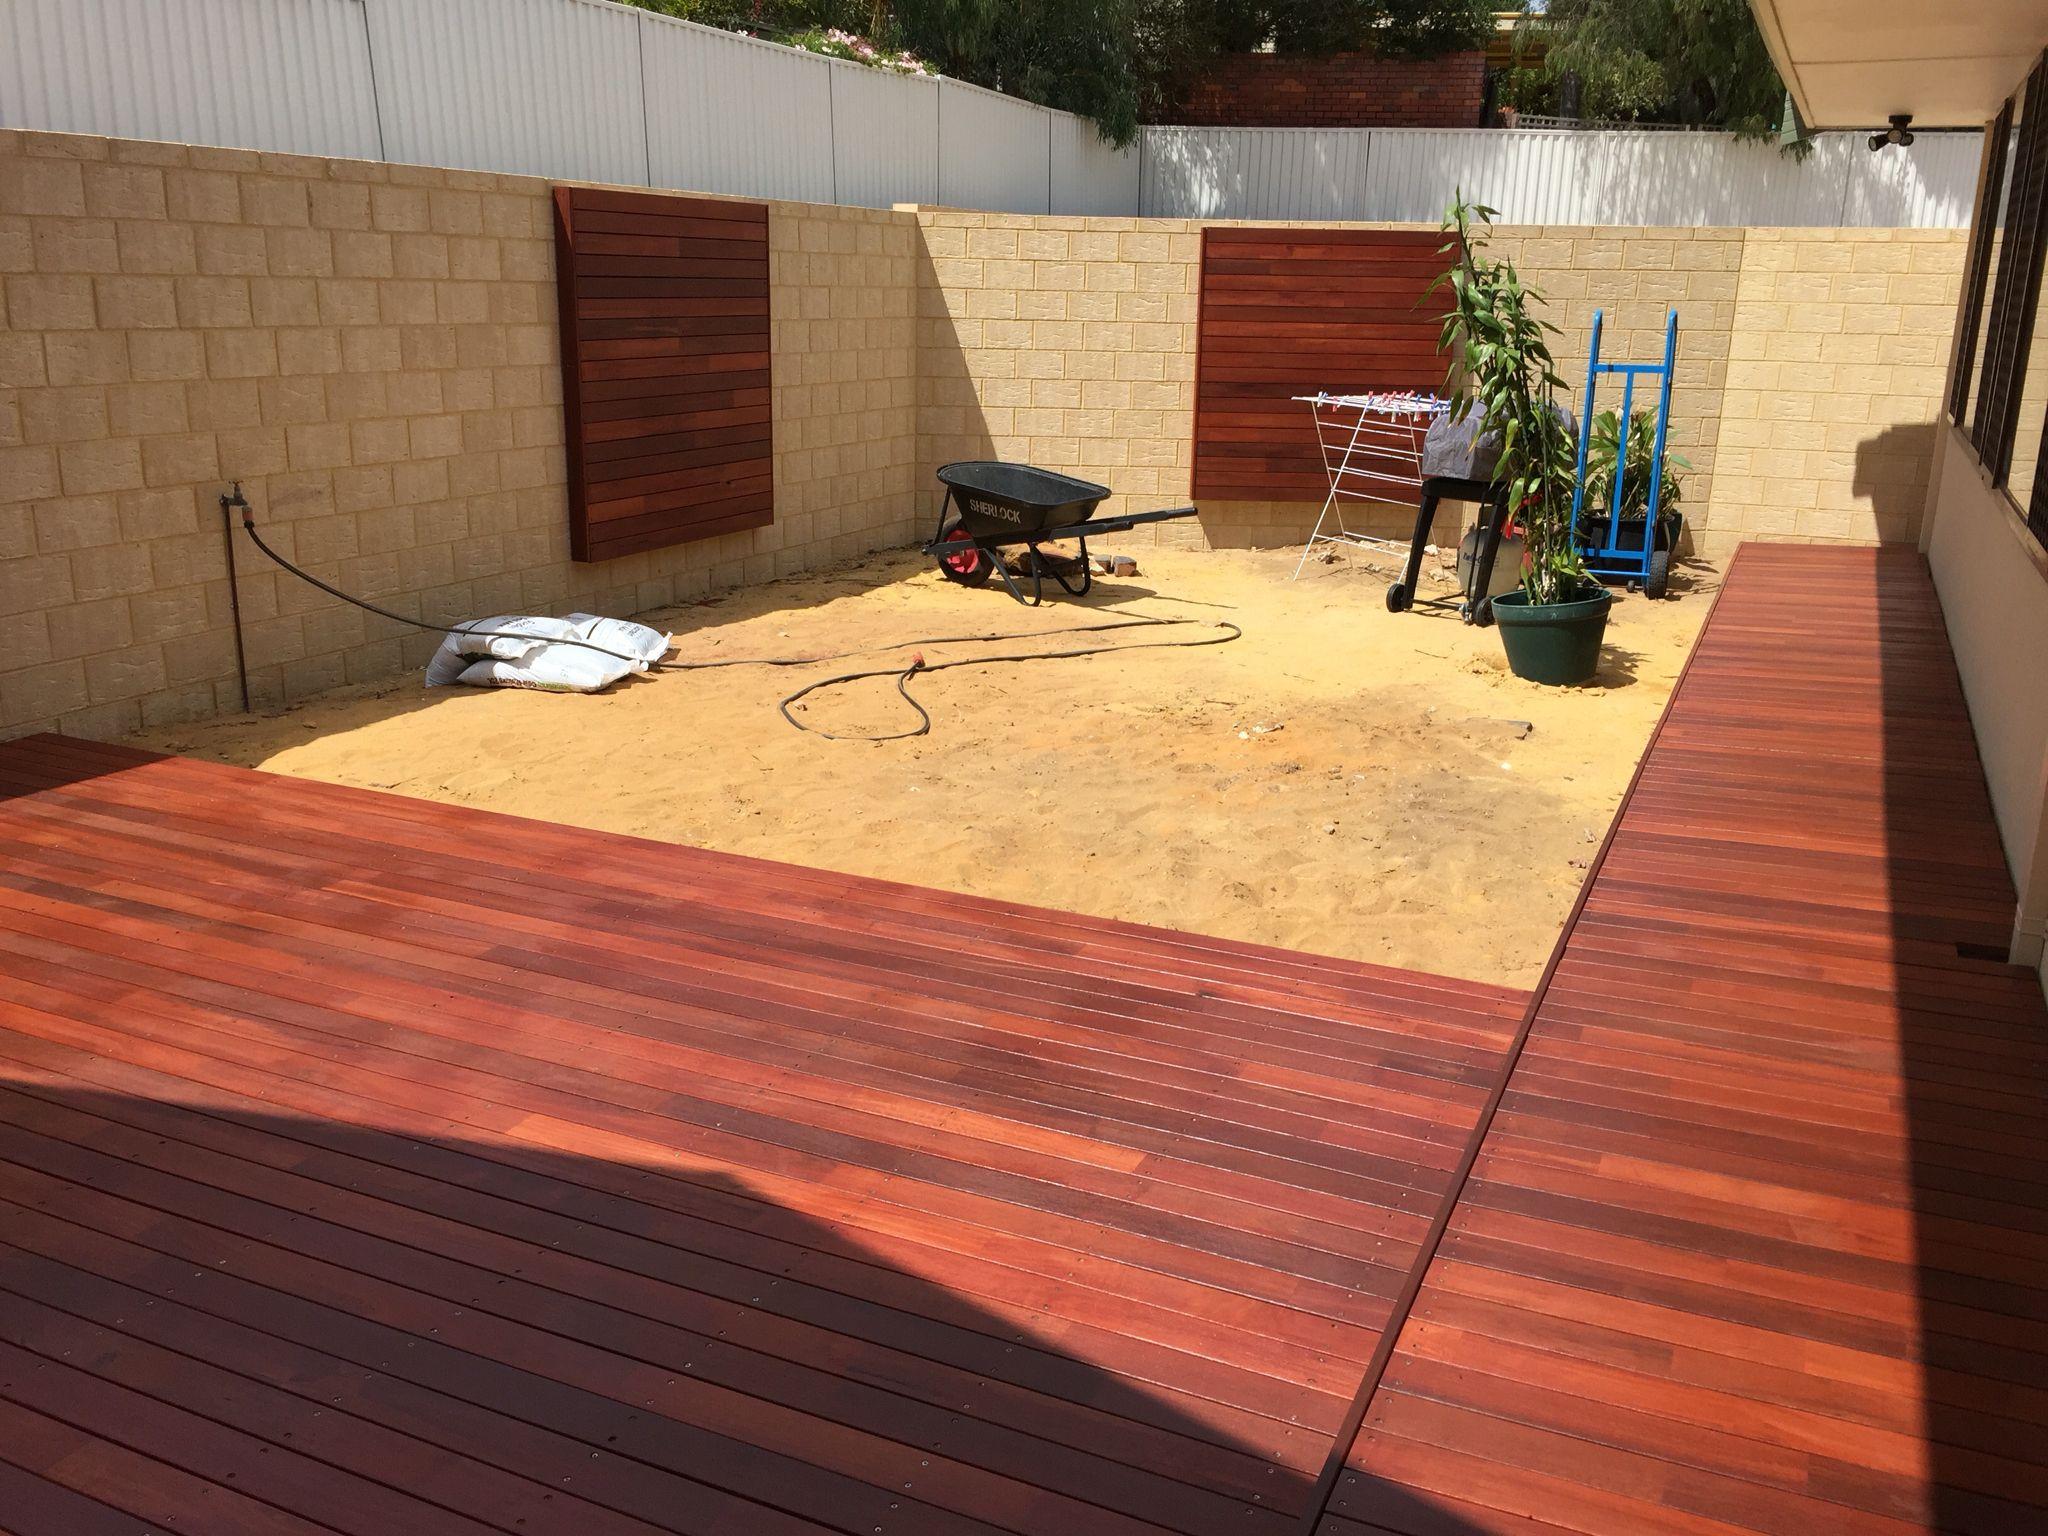 Jarrah Decking and Wall Panels | Home Carpentry | Pinterest ...